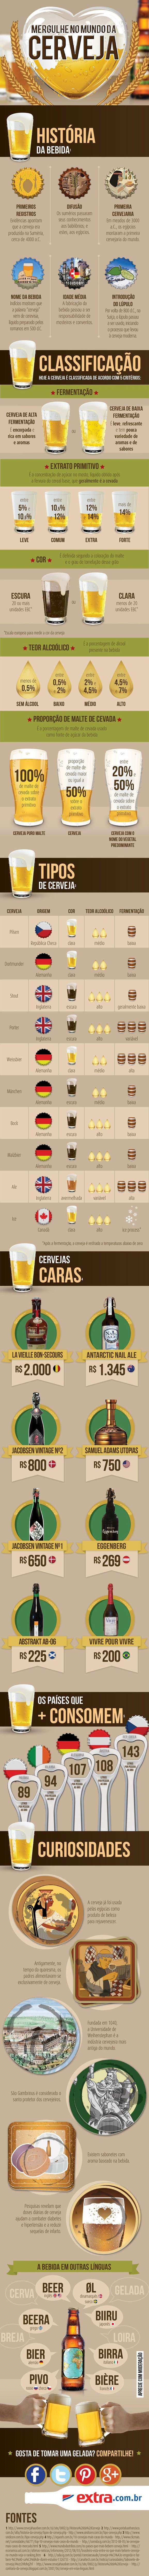 O infográfico da cerveja | Testosterona